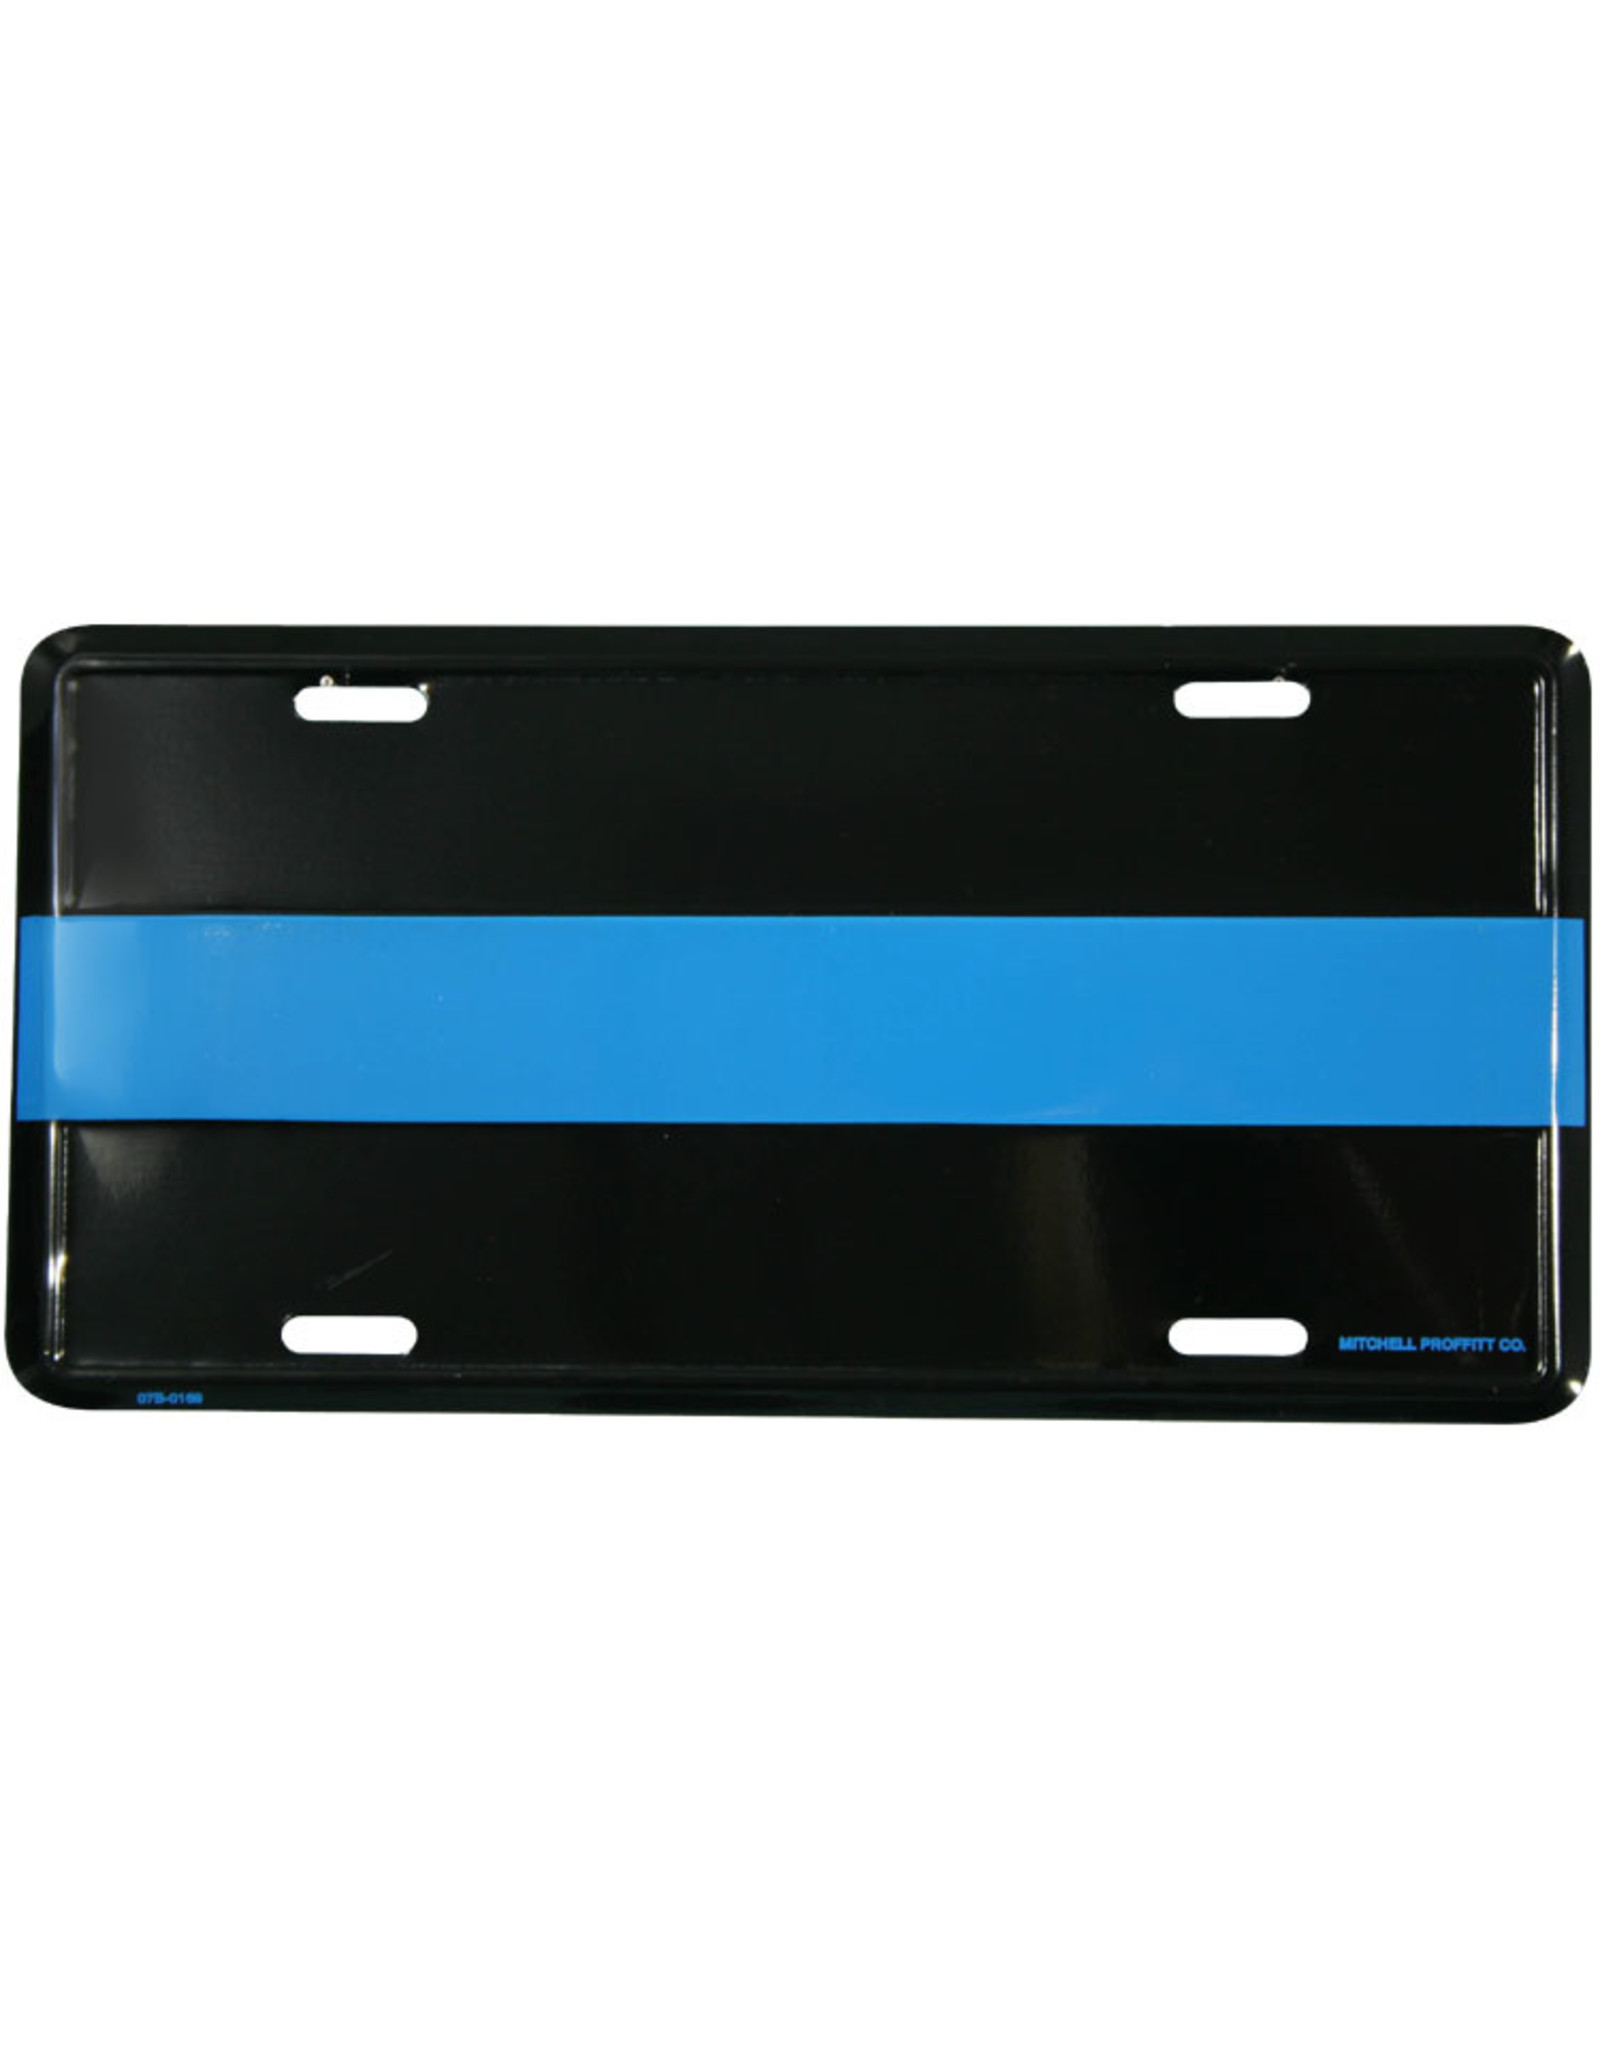 License Plate - Blue Line